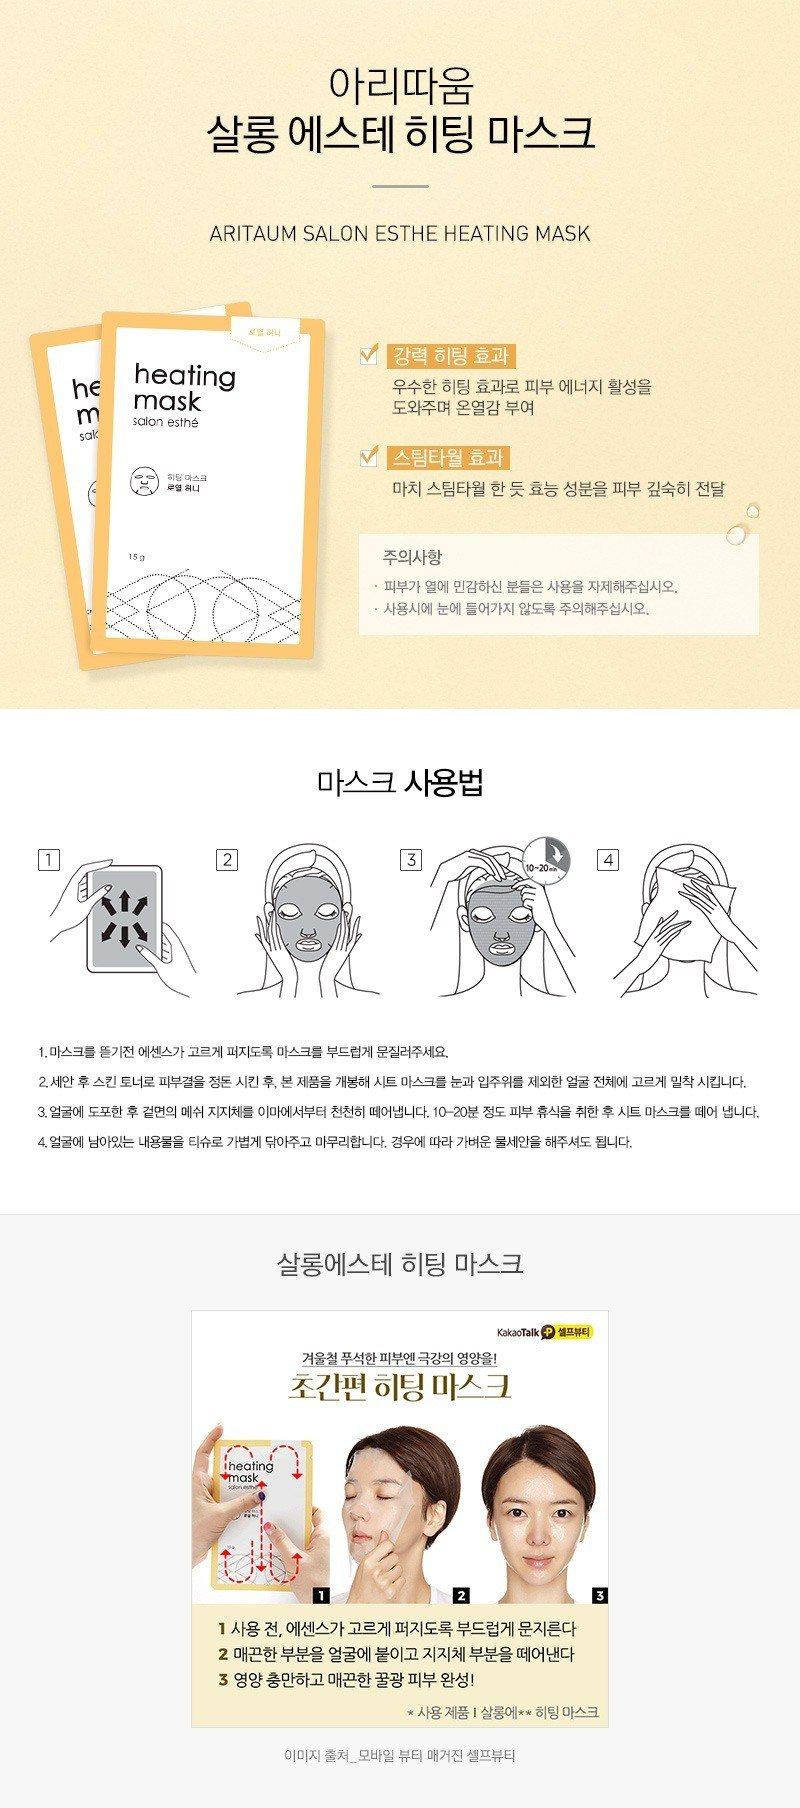 ARITAUM Salon Esthe Heating Mask 27g x 3 pcs